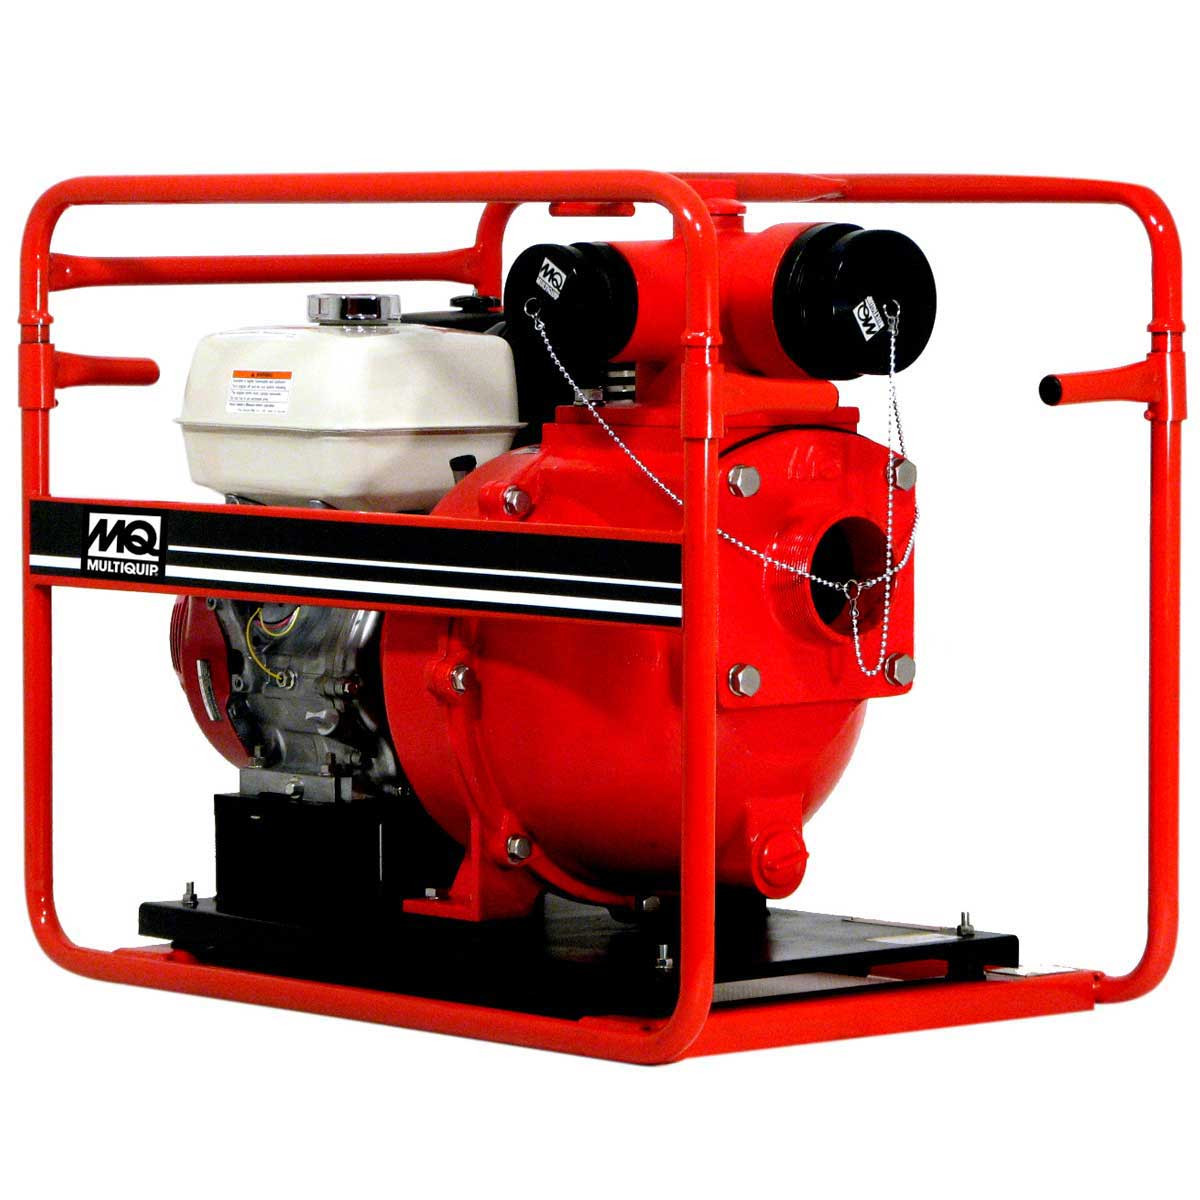 Multiquip water pump